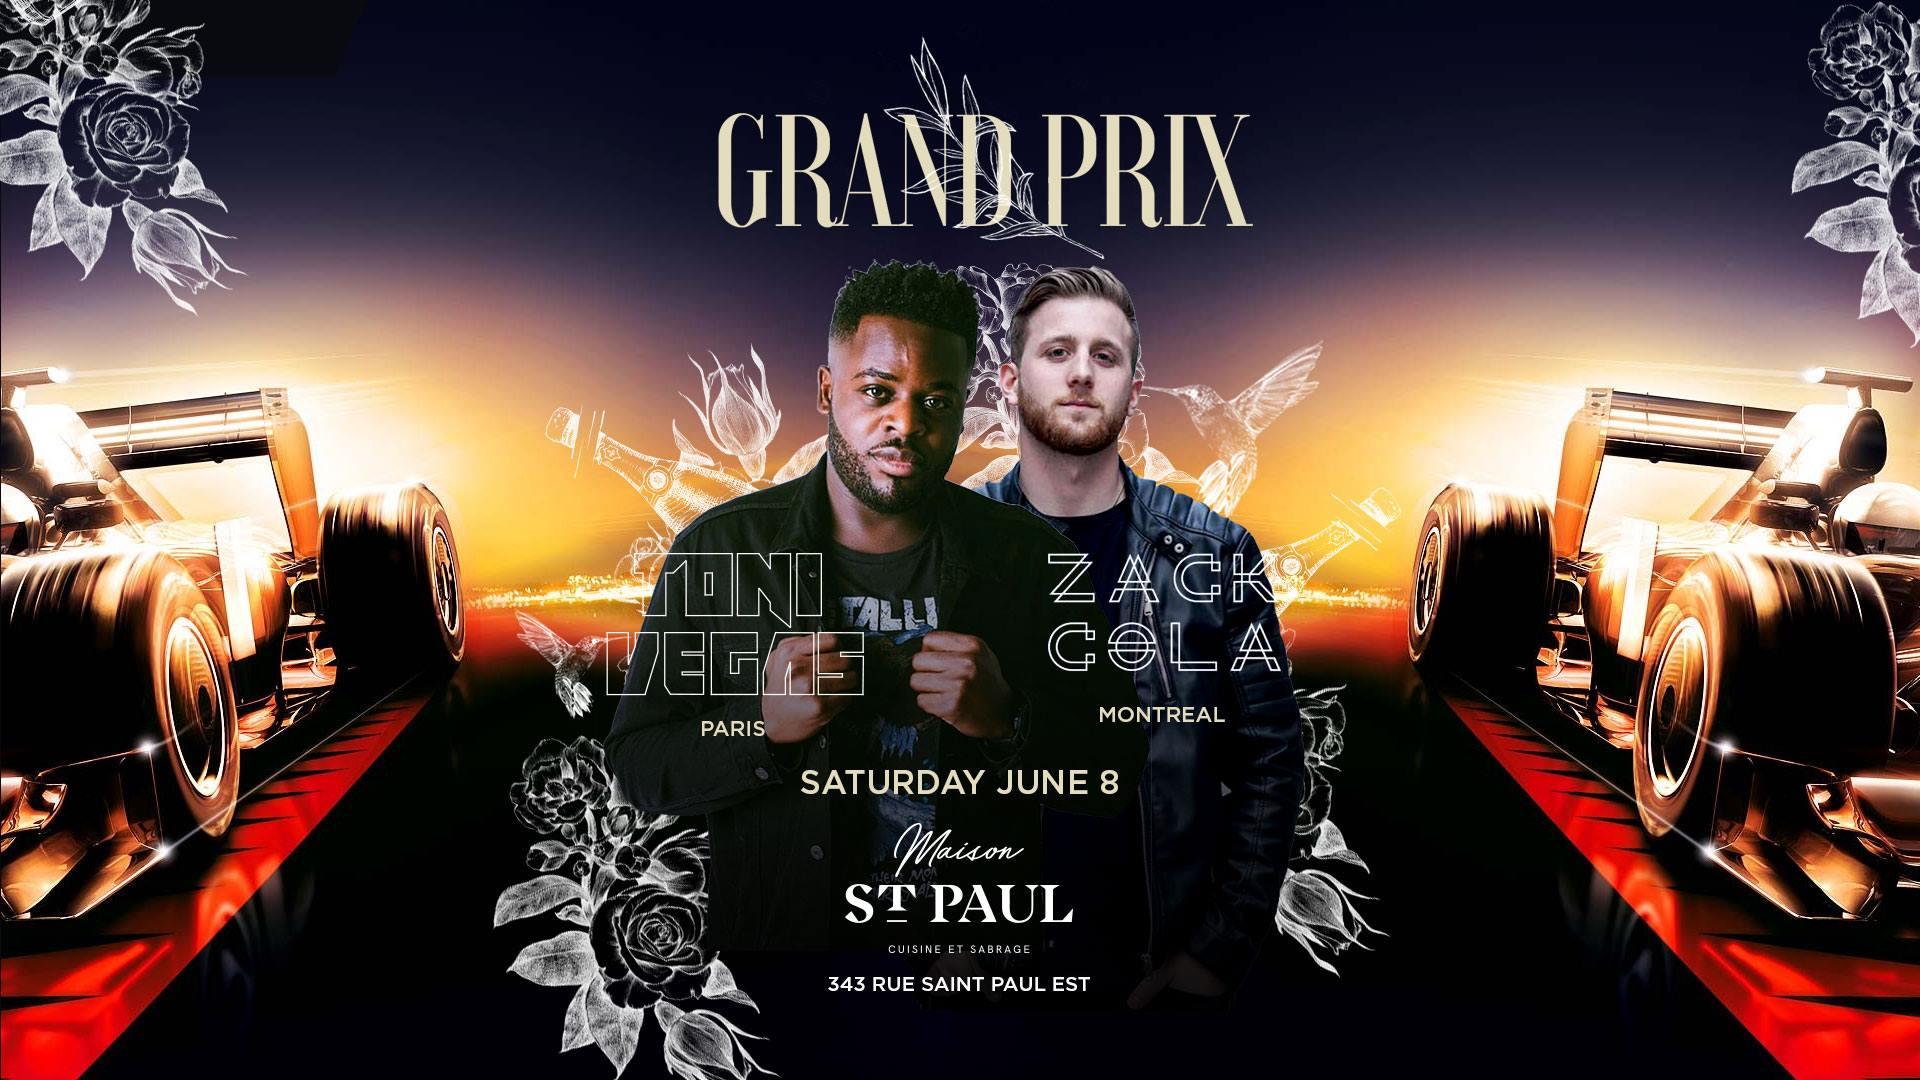 Grand Prix 2019 | Saturday June 8th Toni Vegas